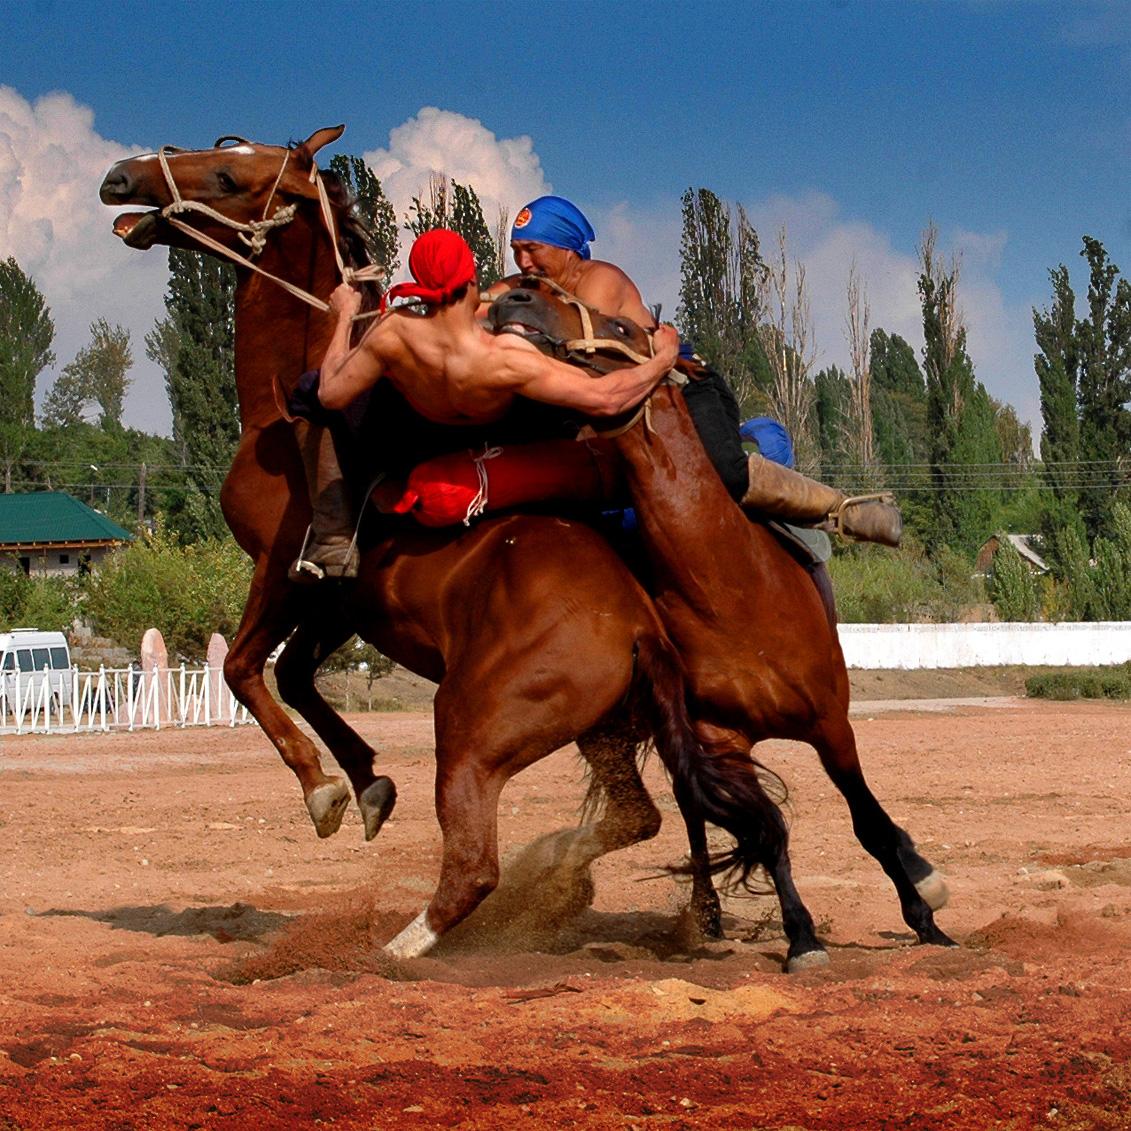 kyrgyzstan-world-nomad-games-alex-mardikian-2018-ambassador-wrestle